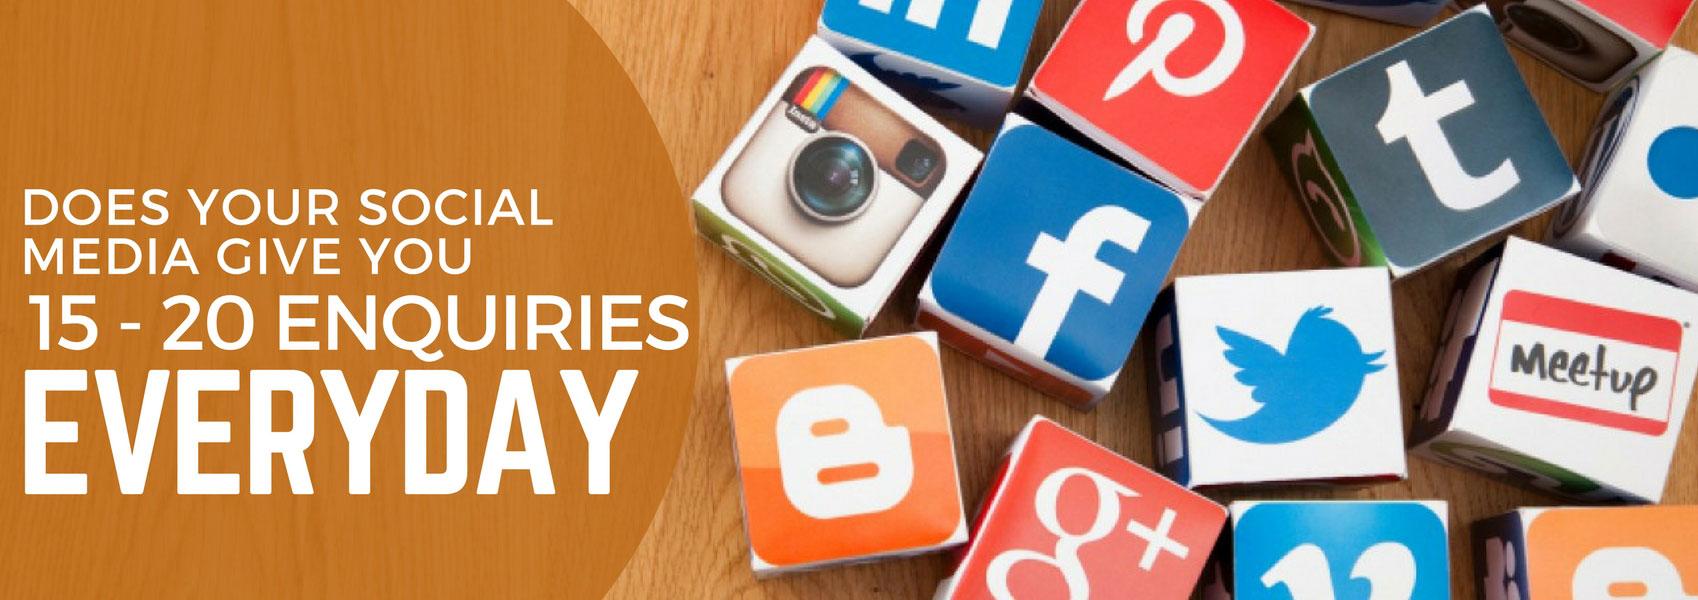 Social Media Marketing Agency for Restaurant, Mappfy